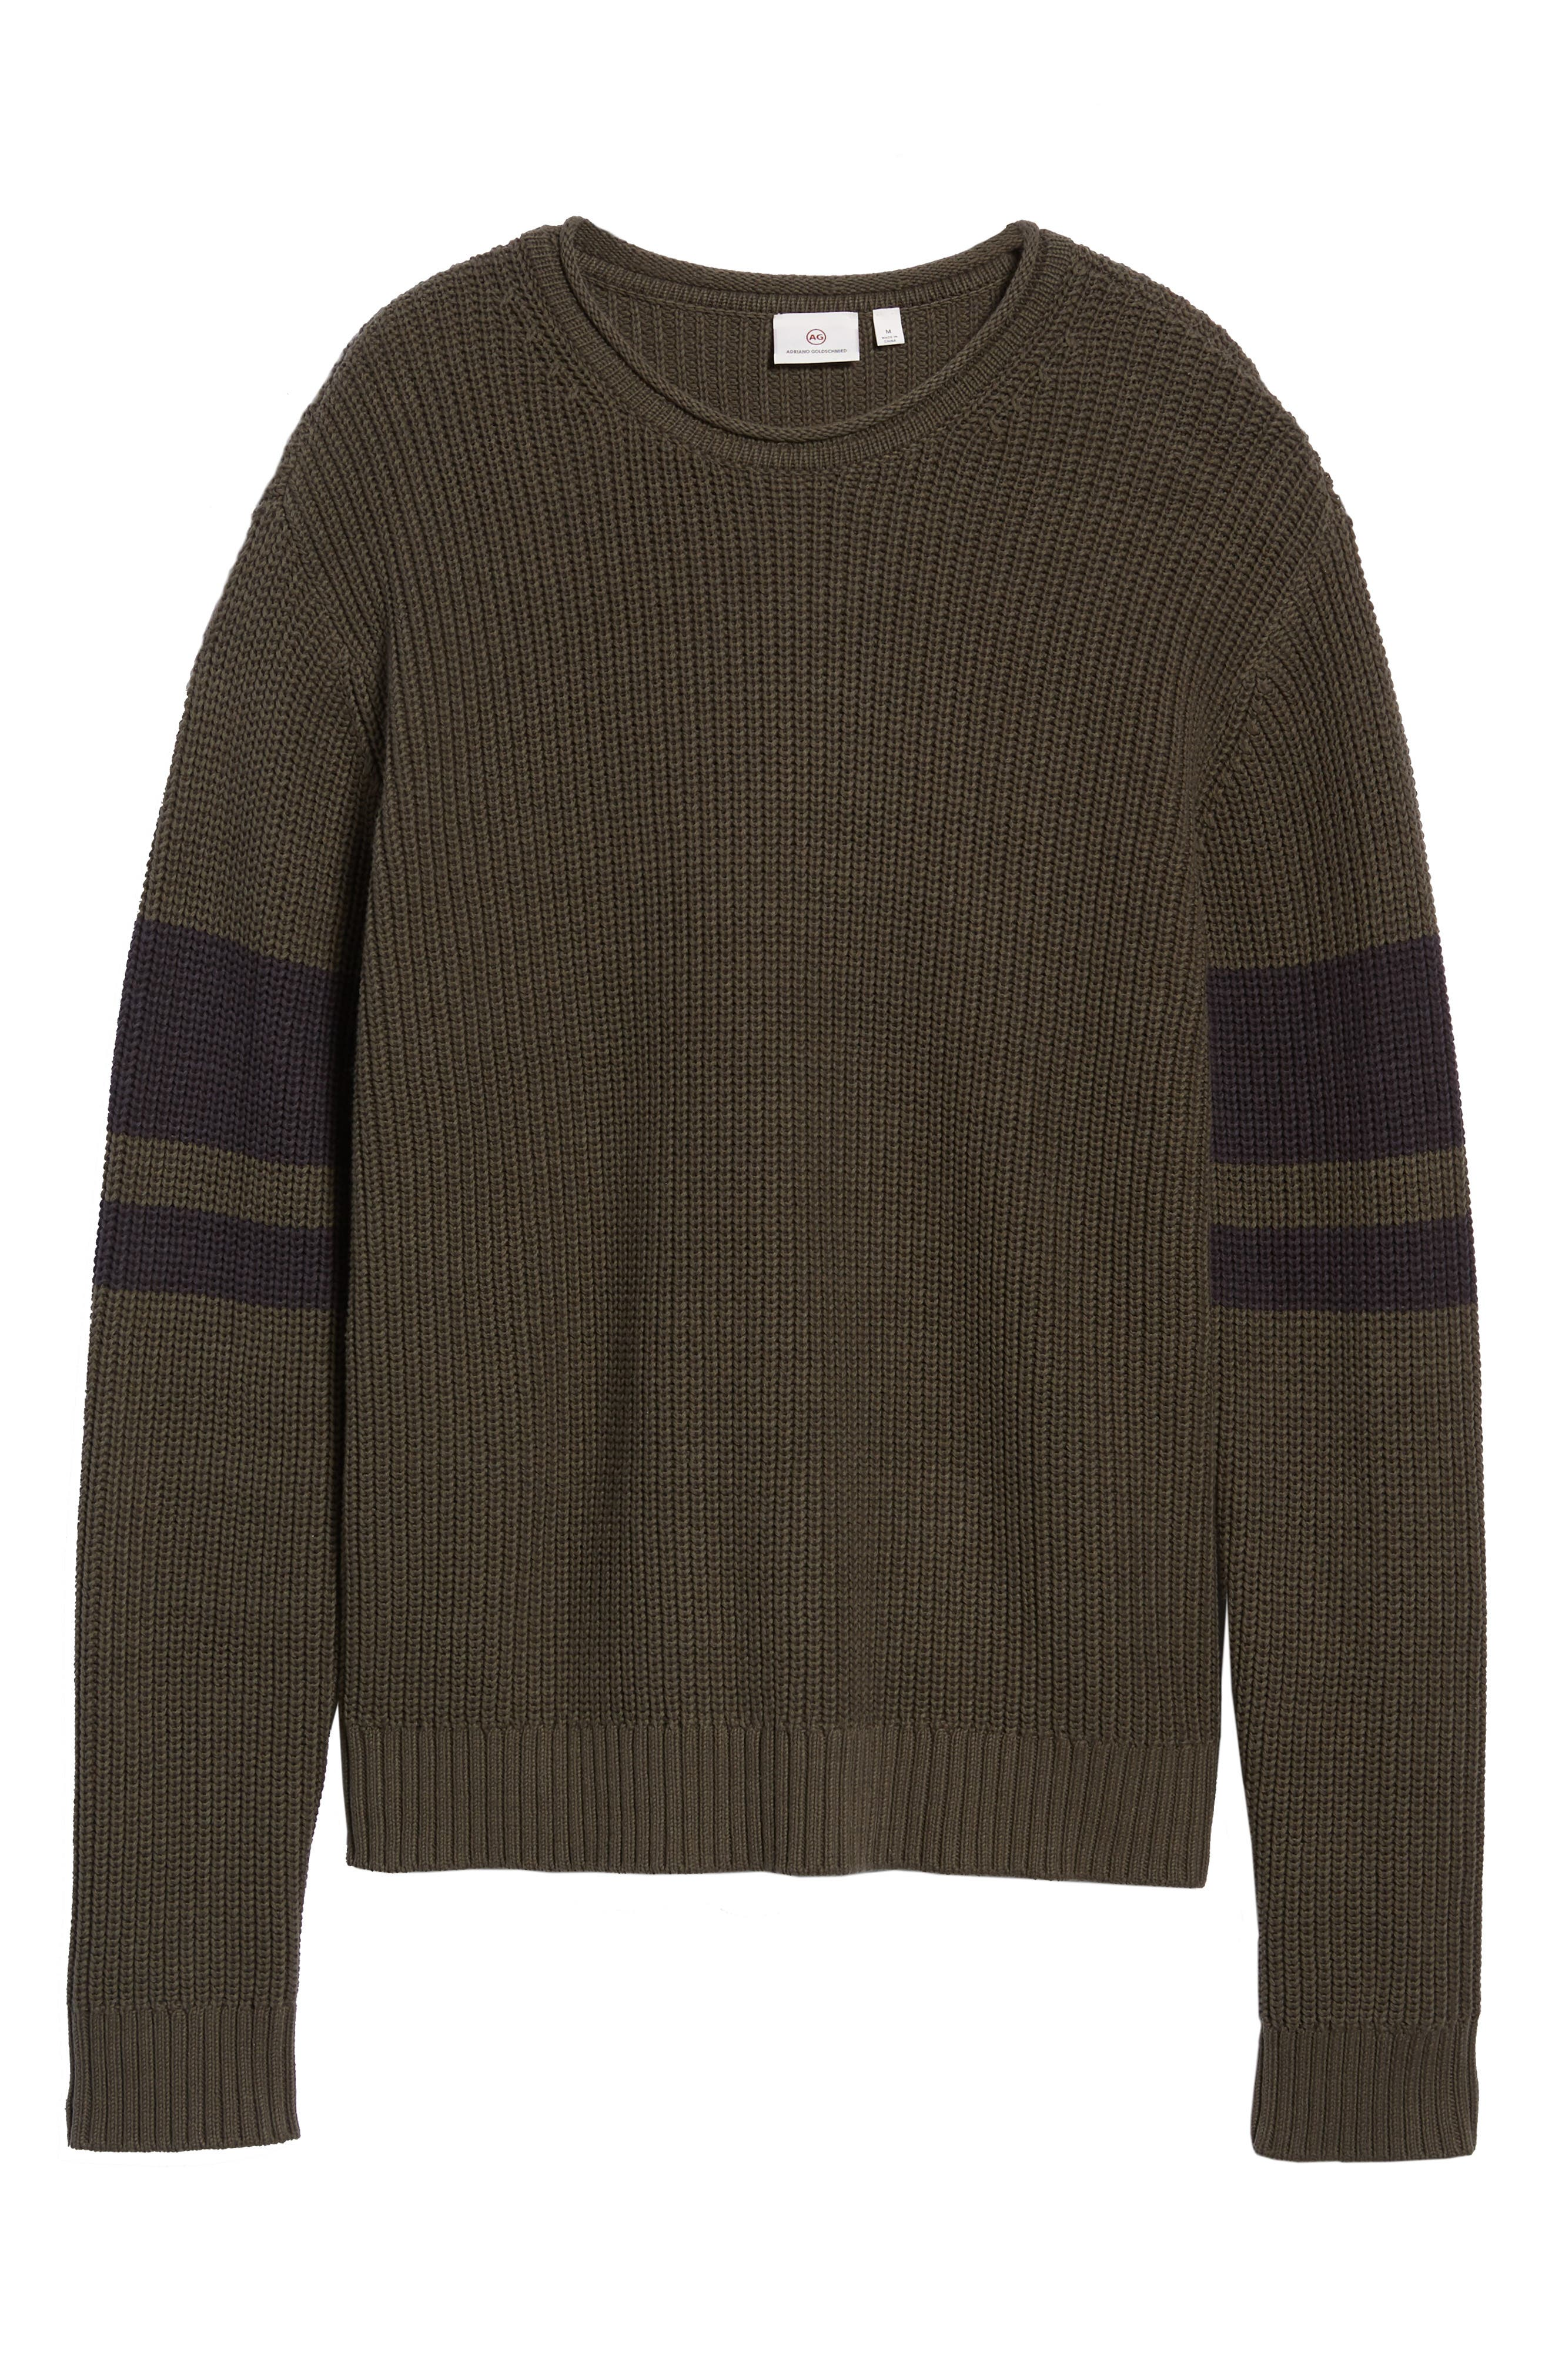 Jett Slim Fit Crewneck Sweater,                             Alternate thumbnail 6, color,                             OAK GROVE/ BLACK